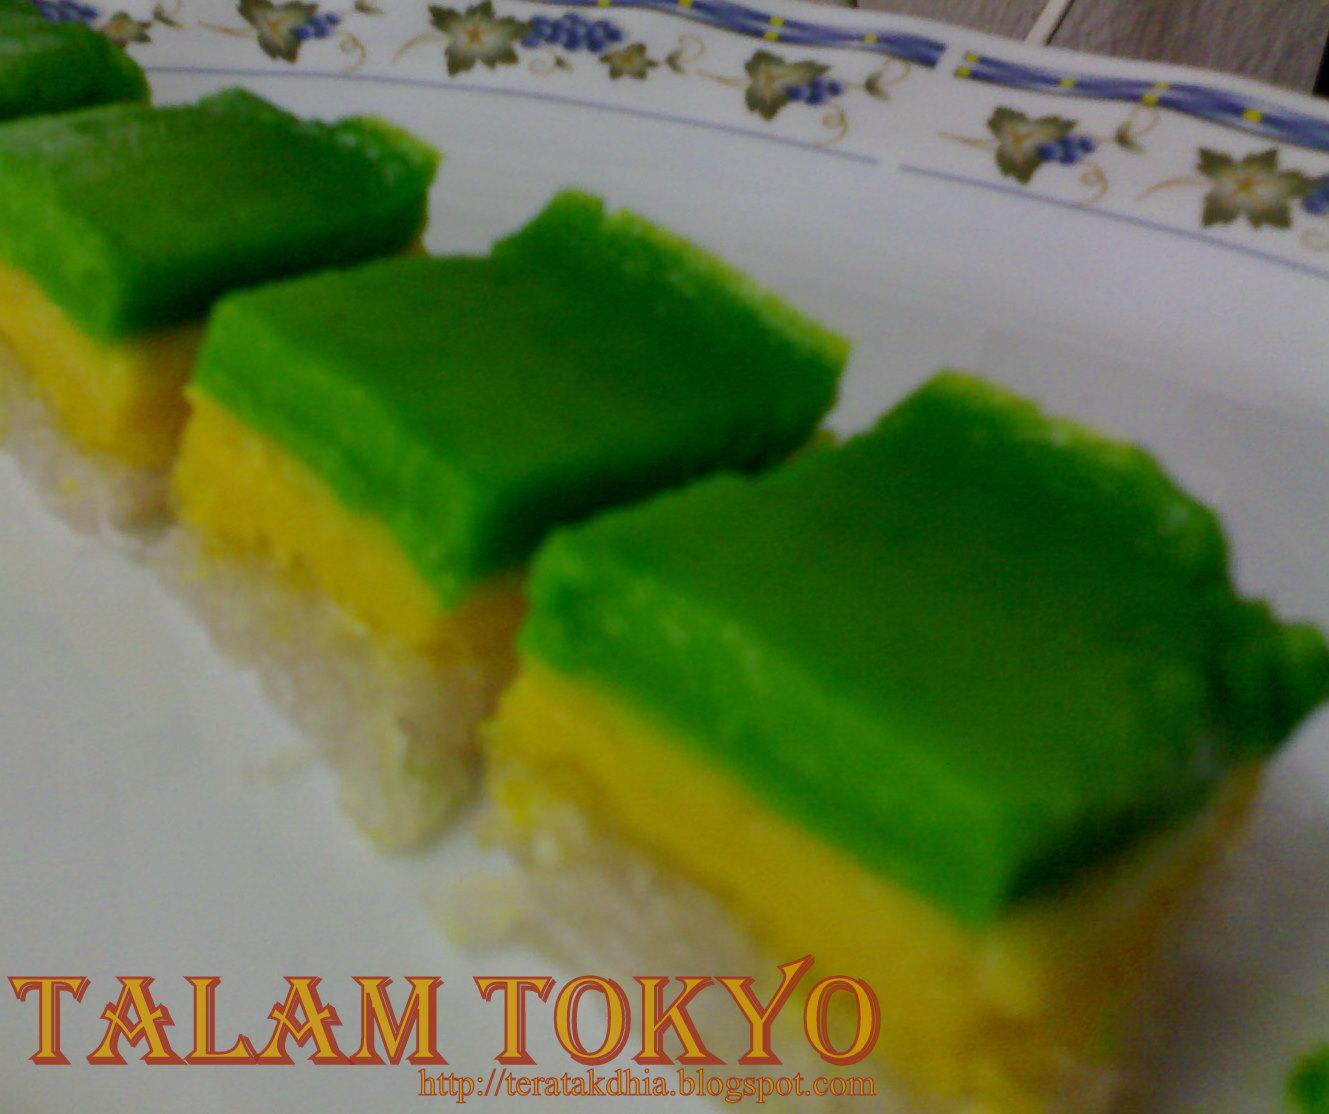 Yuslindhia Zamani: Talam Tokyo / Talam Suun